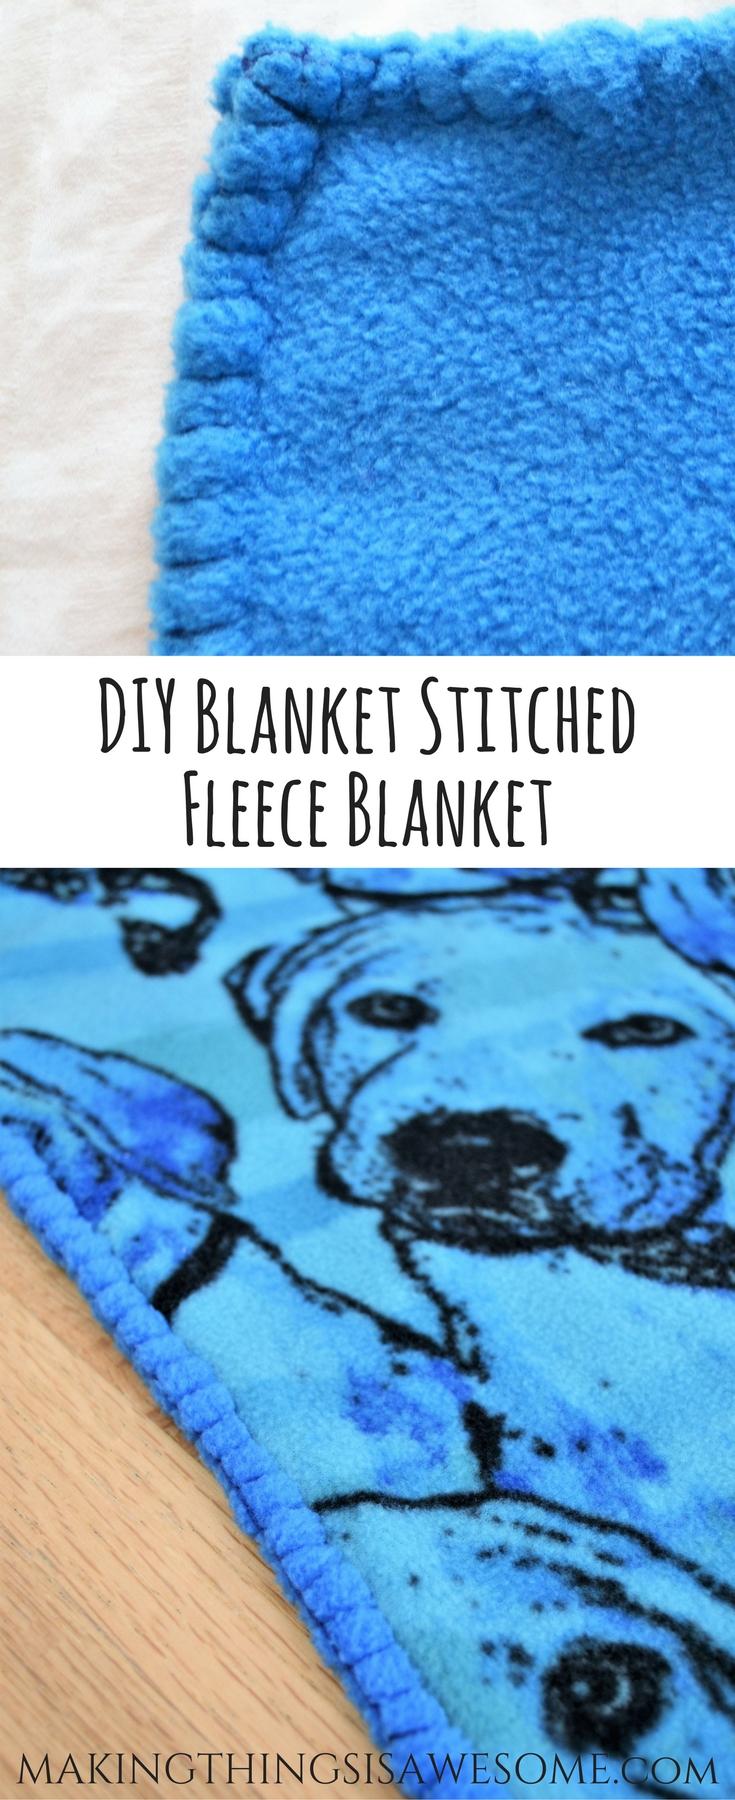 Hand Sewn Fleece Toddler Blanket Tutorial! - The Blanket Stitch! - pin